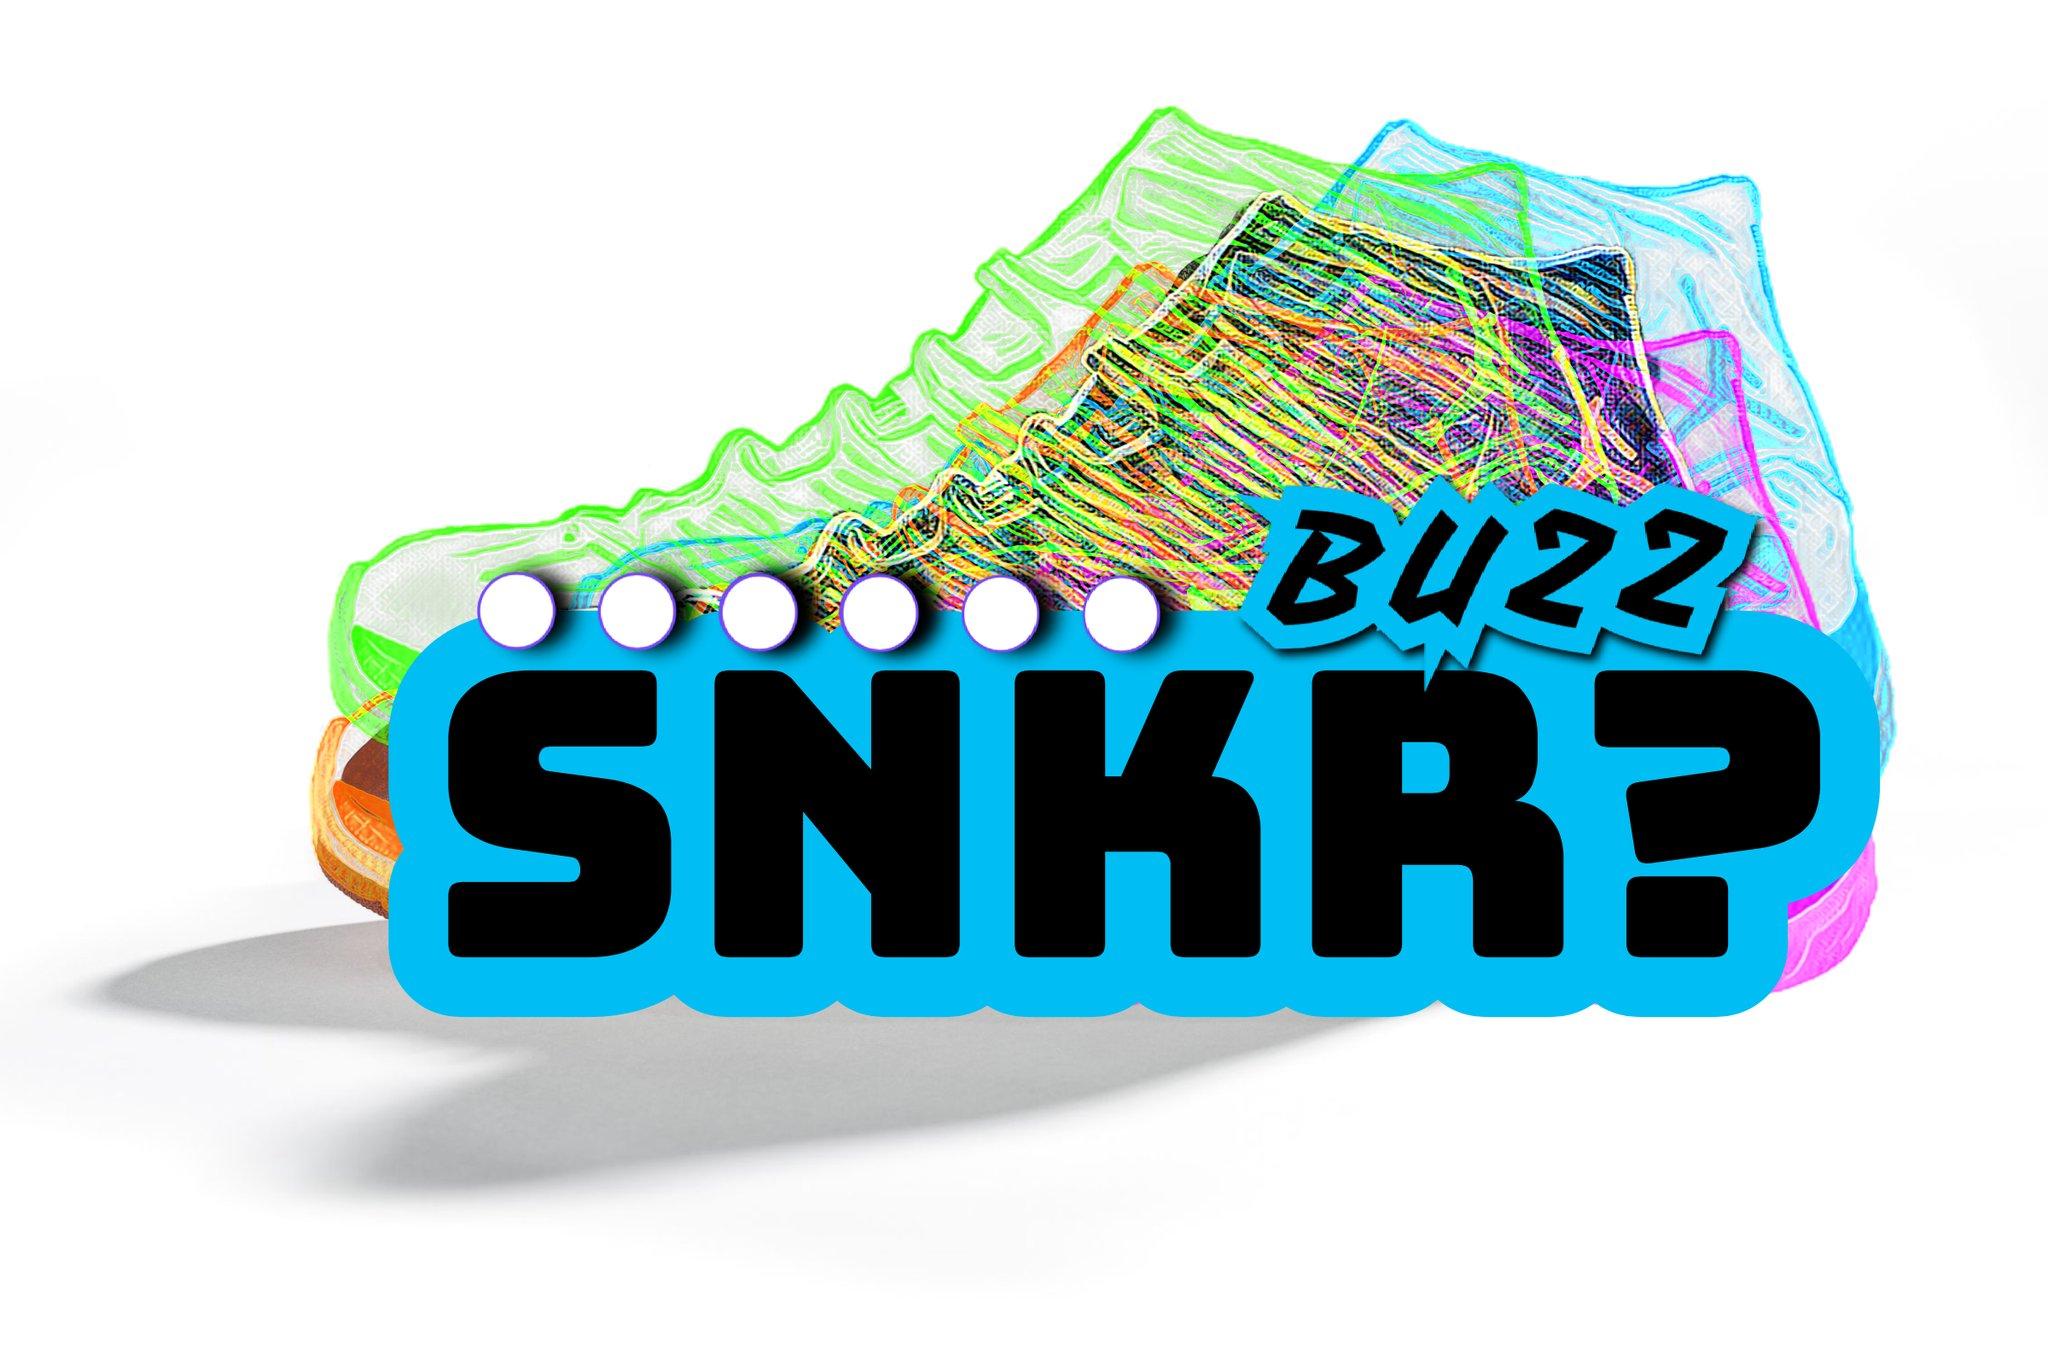 Nike Air Foamposite One Snakeskin Sail BlackHabanero Red